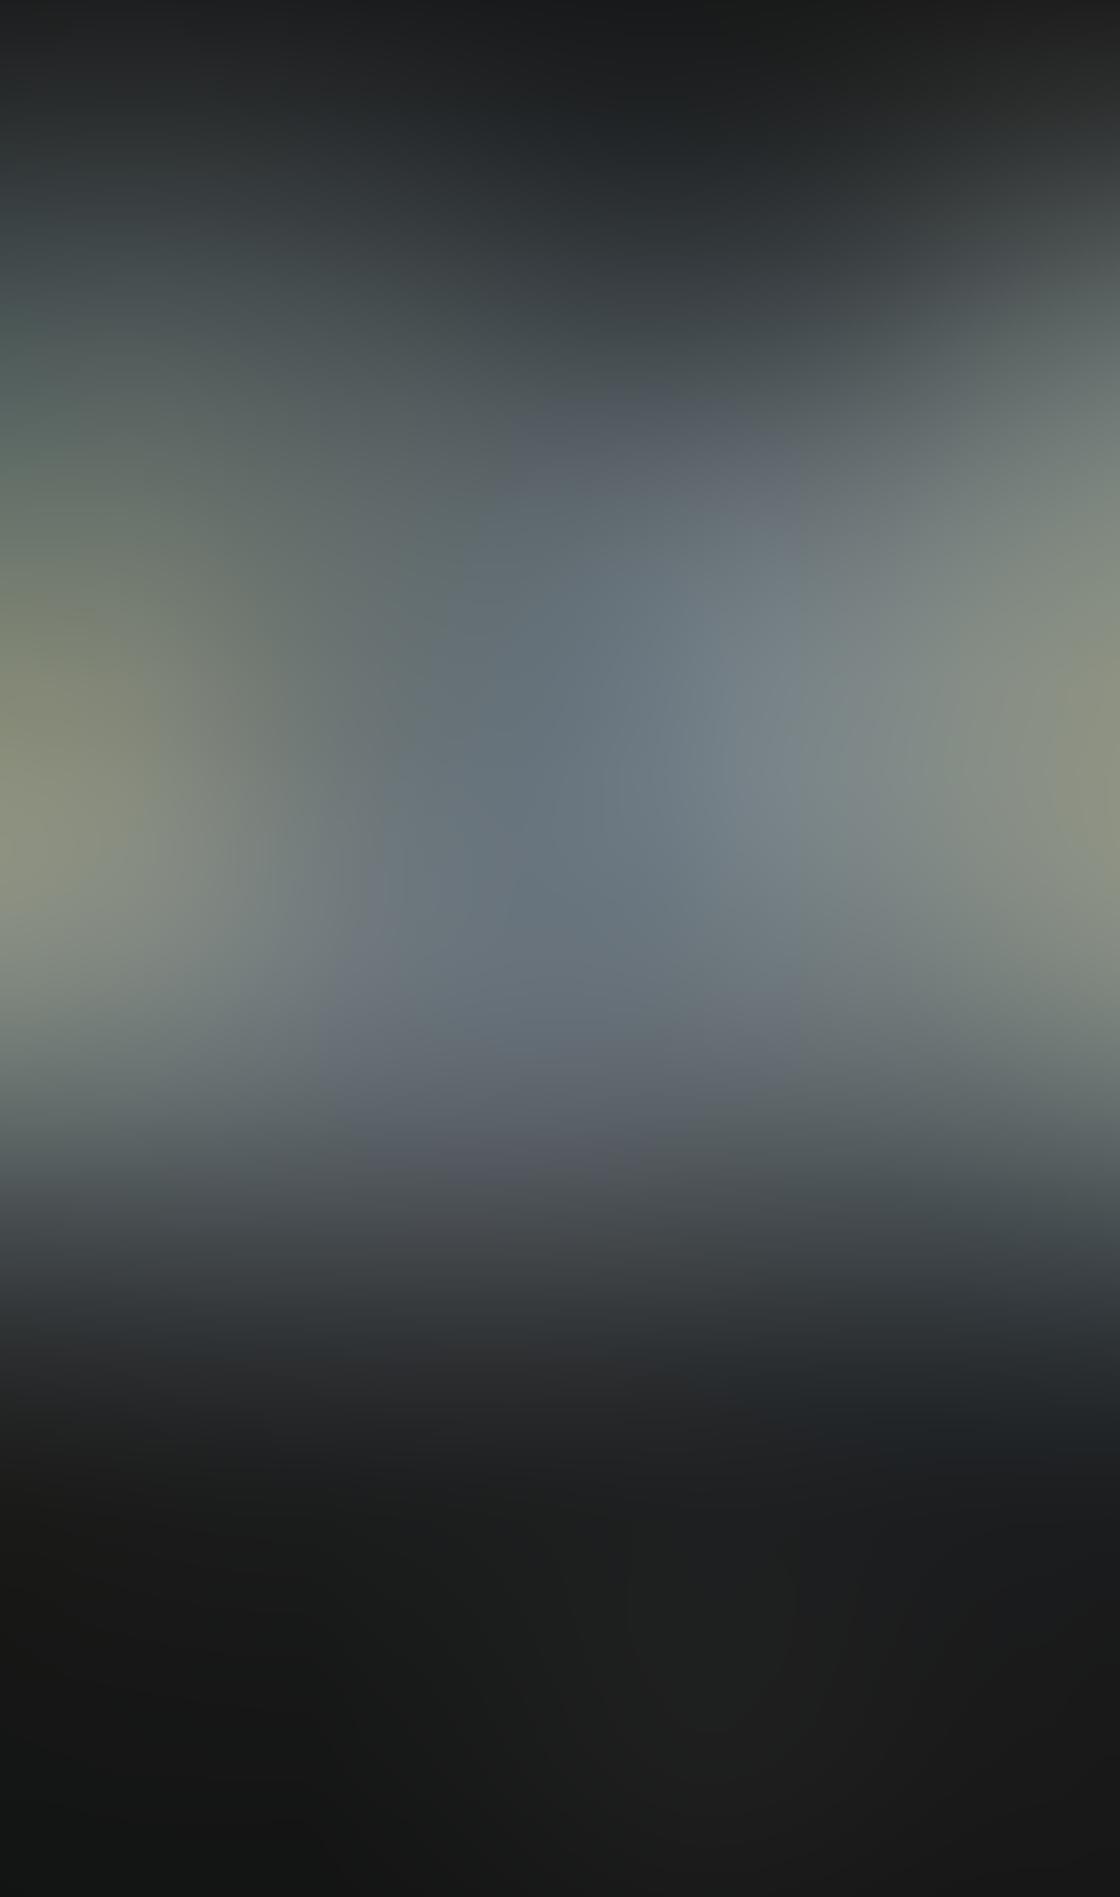 Pixelmator iPhone Editing App 11